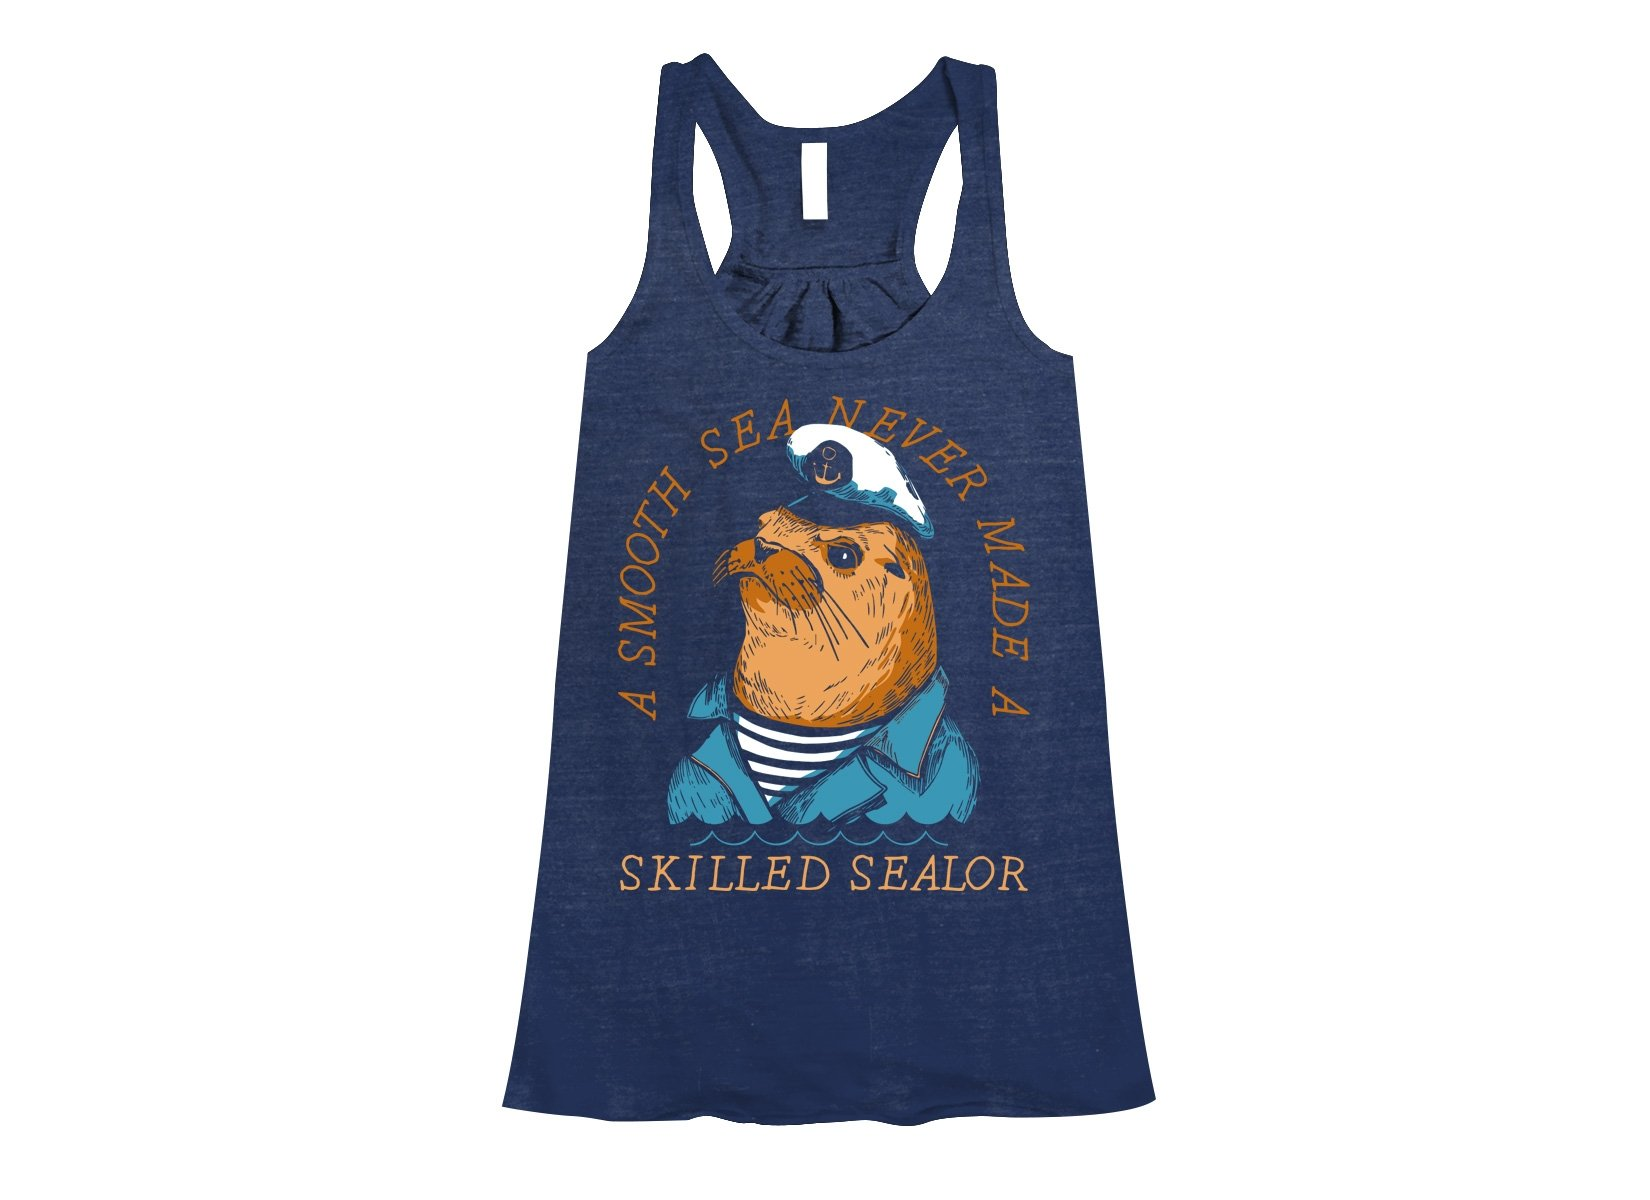 Skilled Sealor on Womens Tanks T-Shirt